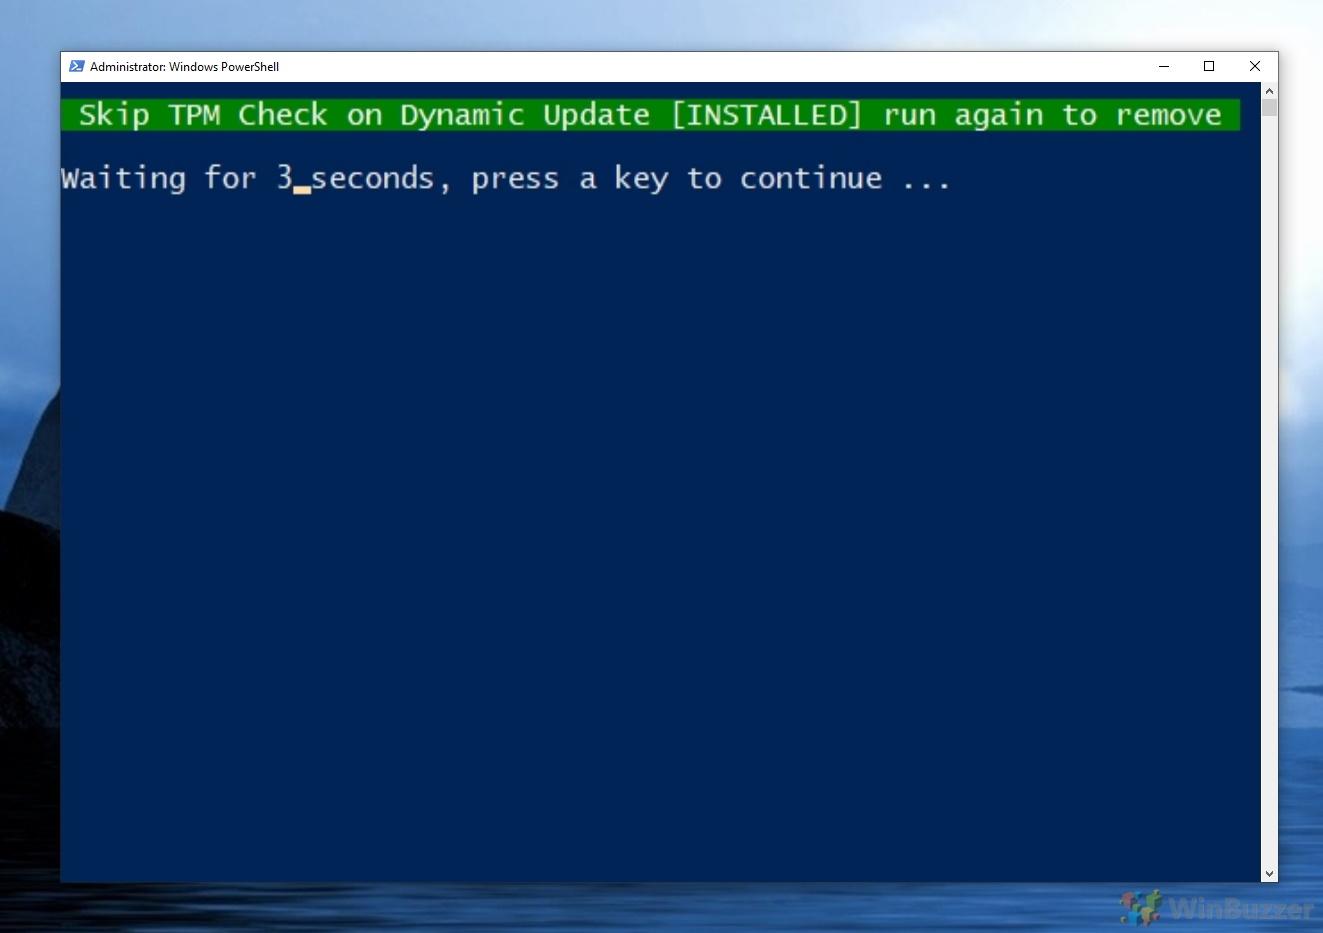 Skip TPM Check on Dynamic Update [Installed]